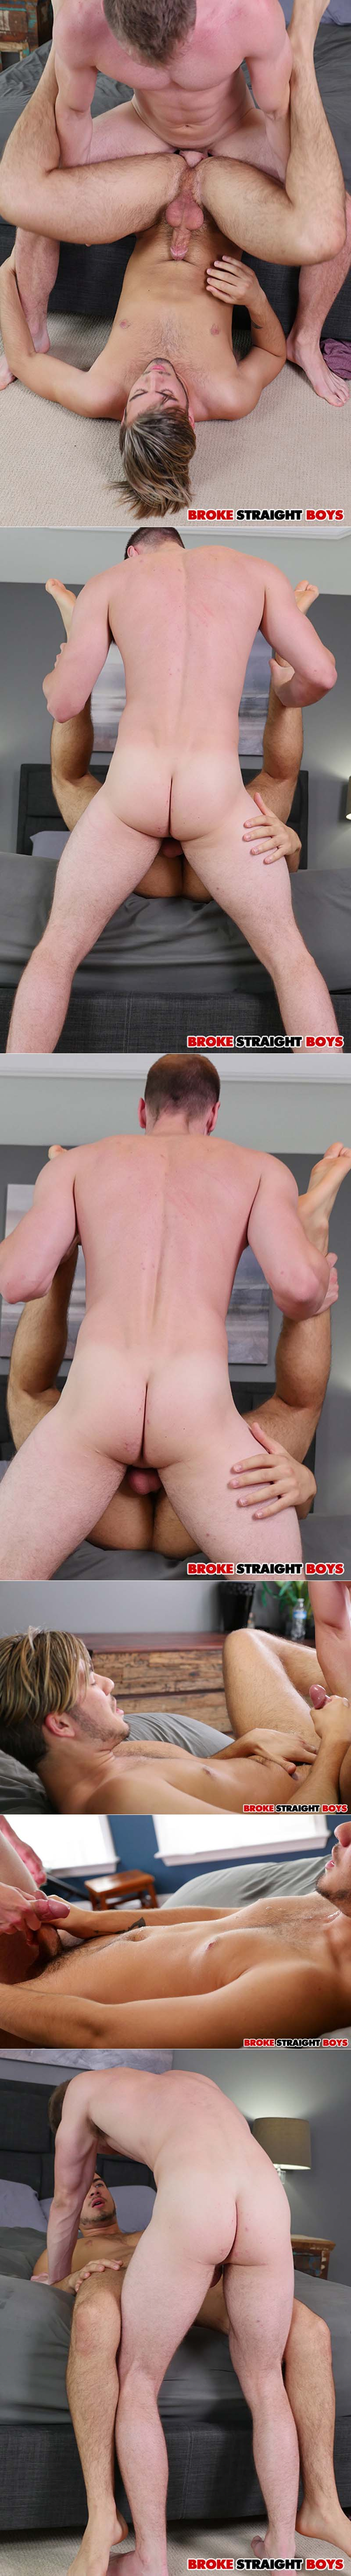 Brandon Evans Fucks Grey Donovan (Bareback) at Broke Straight Boys